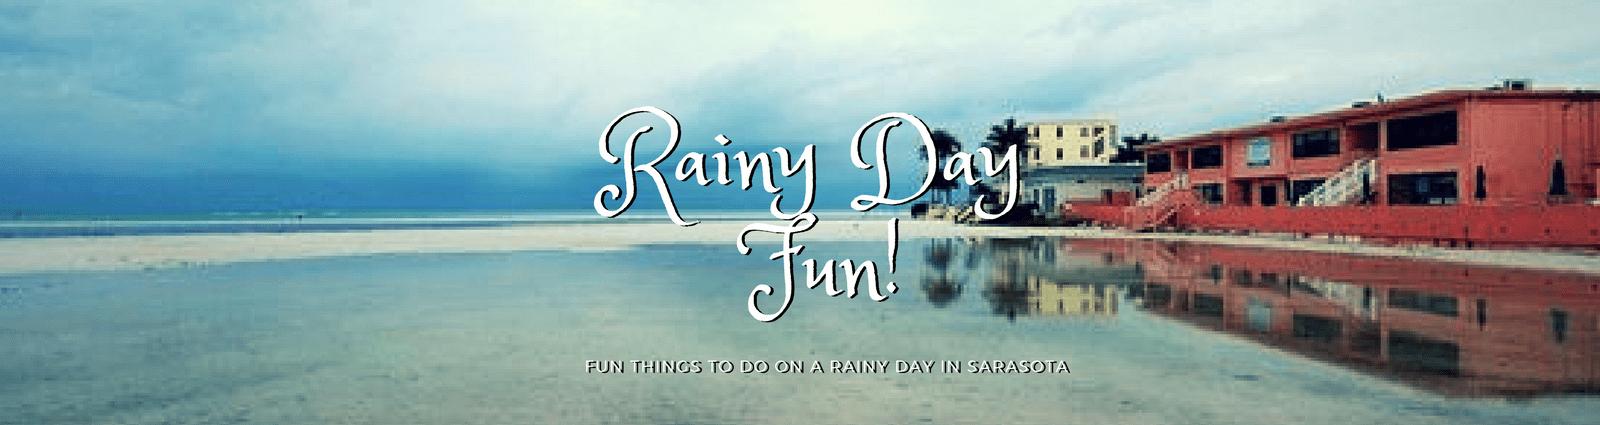 RAINY DAY SARASOTA, Sarasota lifestyle